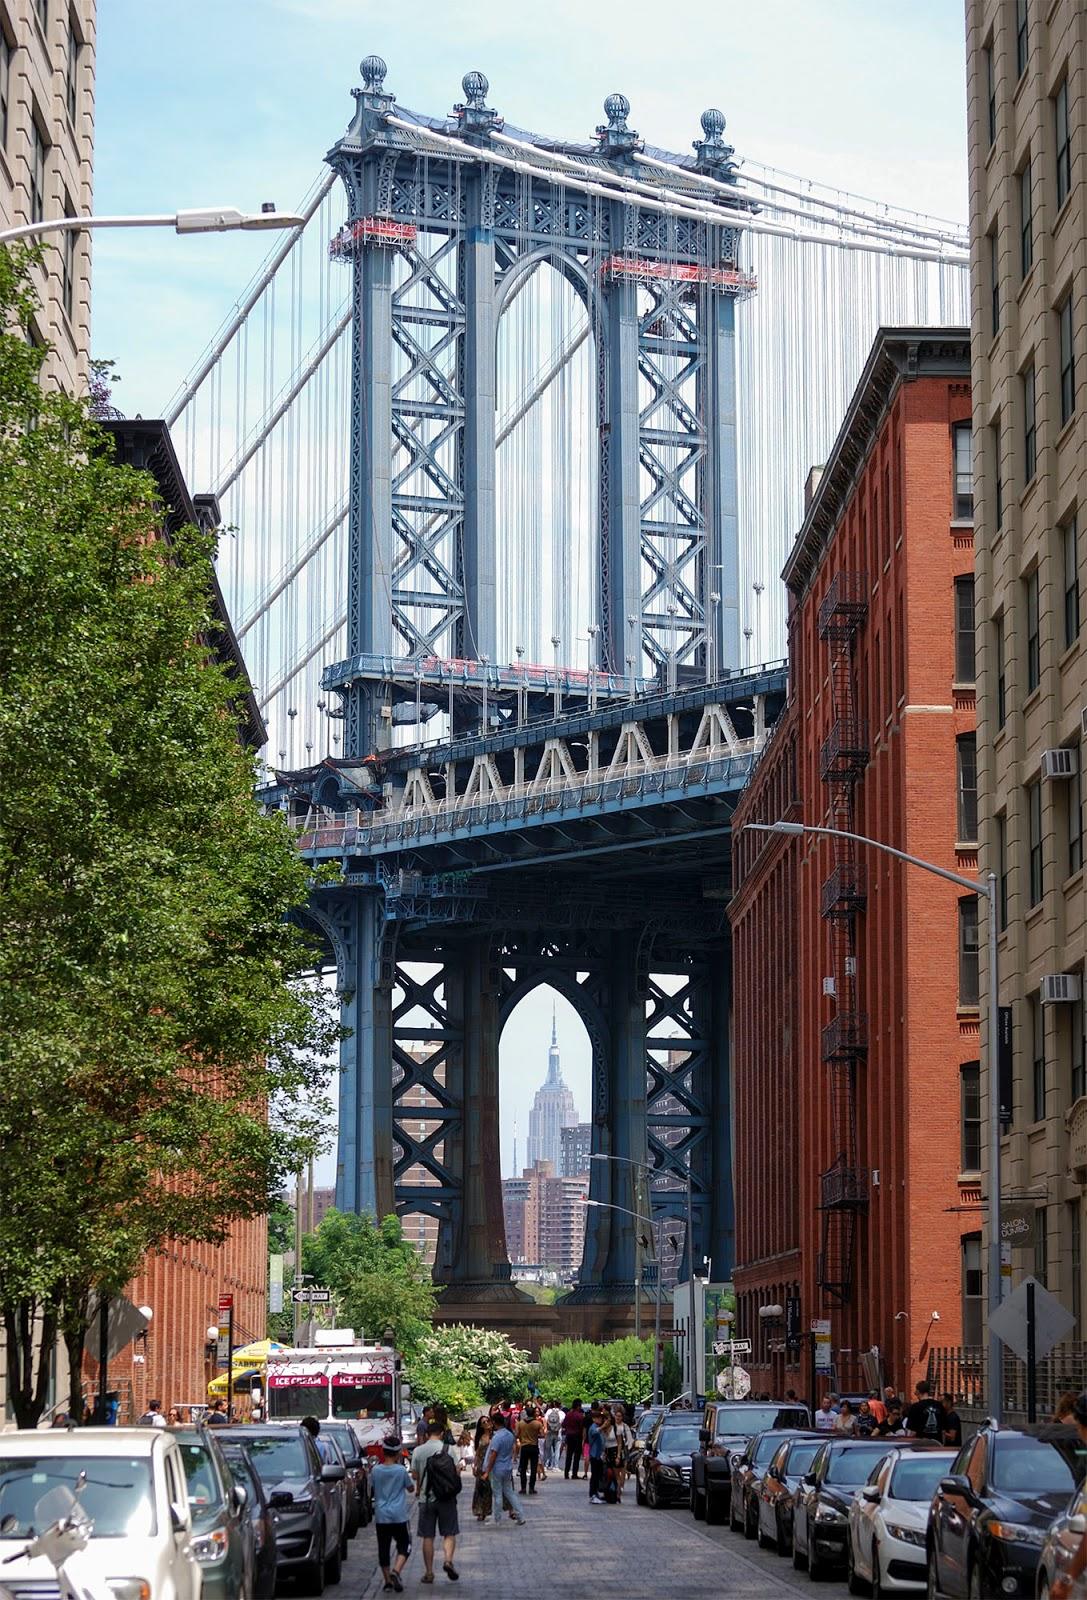 new york itinerary guide plan manhattan bridge dumbo brooklyn empire state building